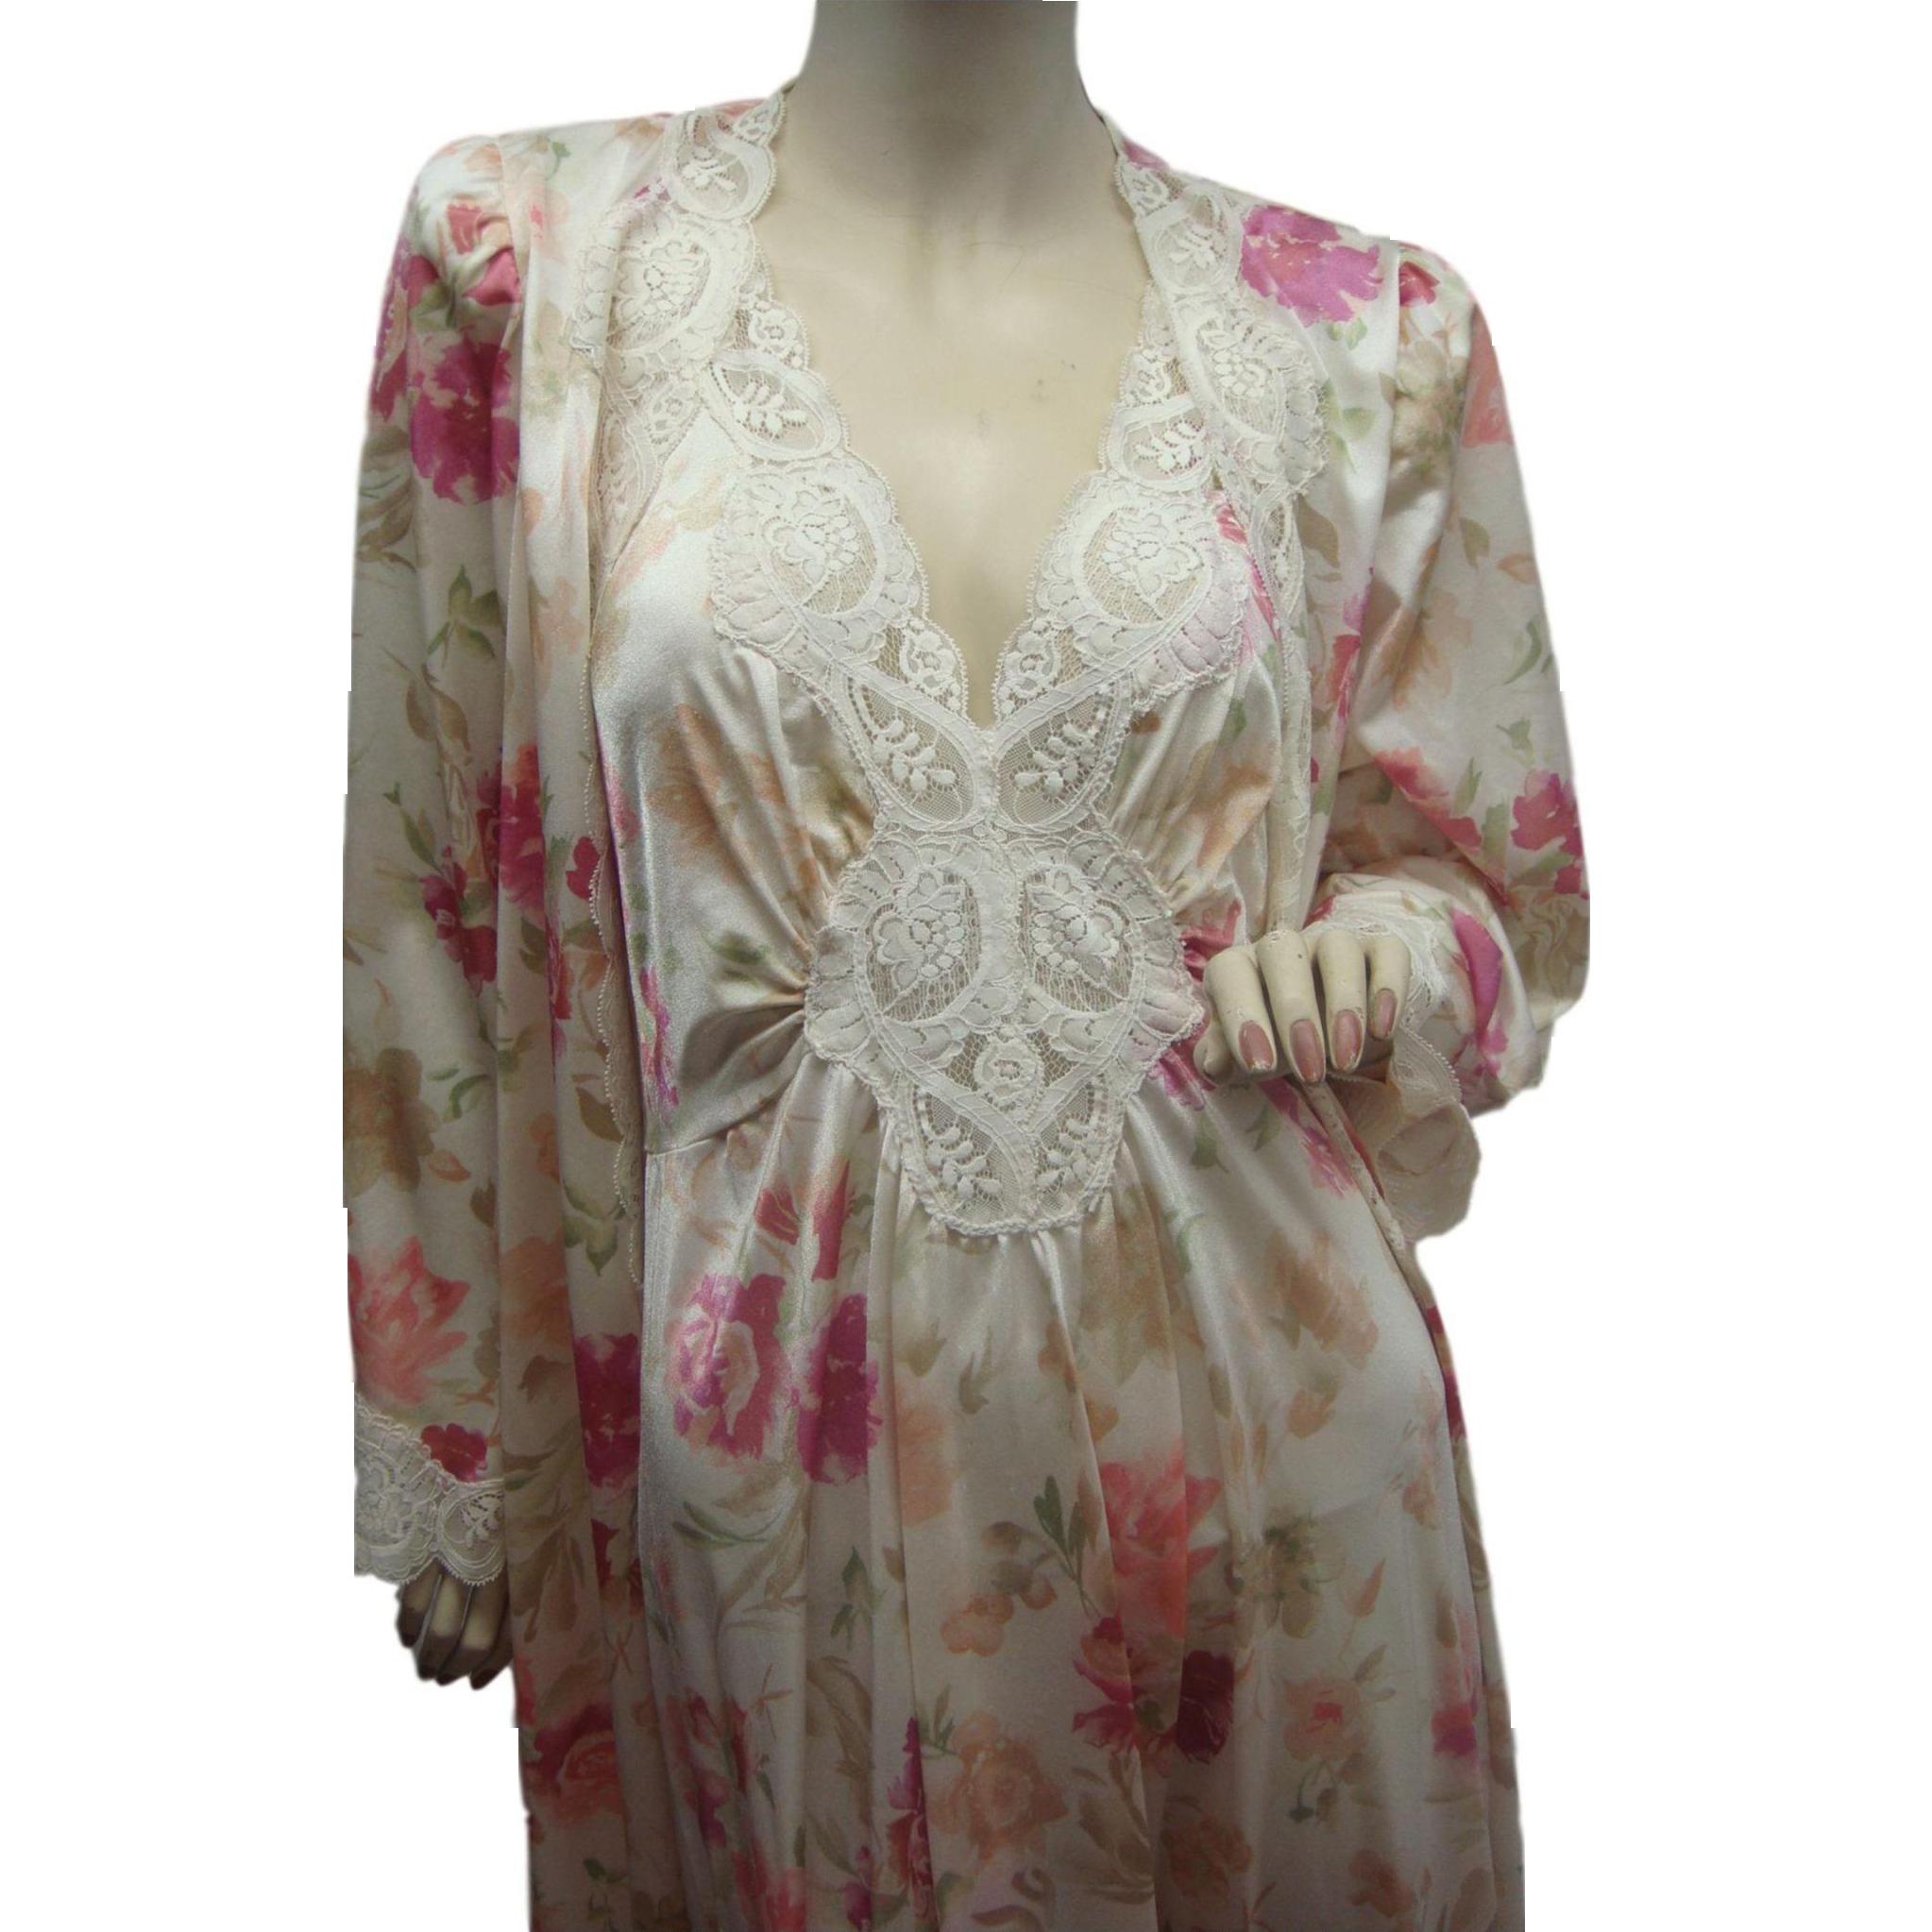 Large Olga Nightgown Peignoir Robe Set Rare Color Pattern Massive 15 Foot Sweep